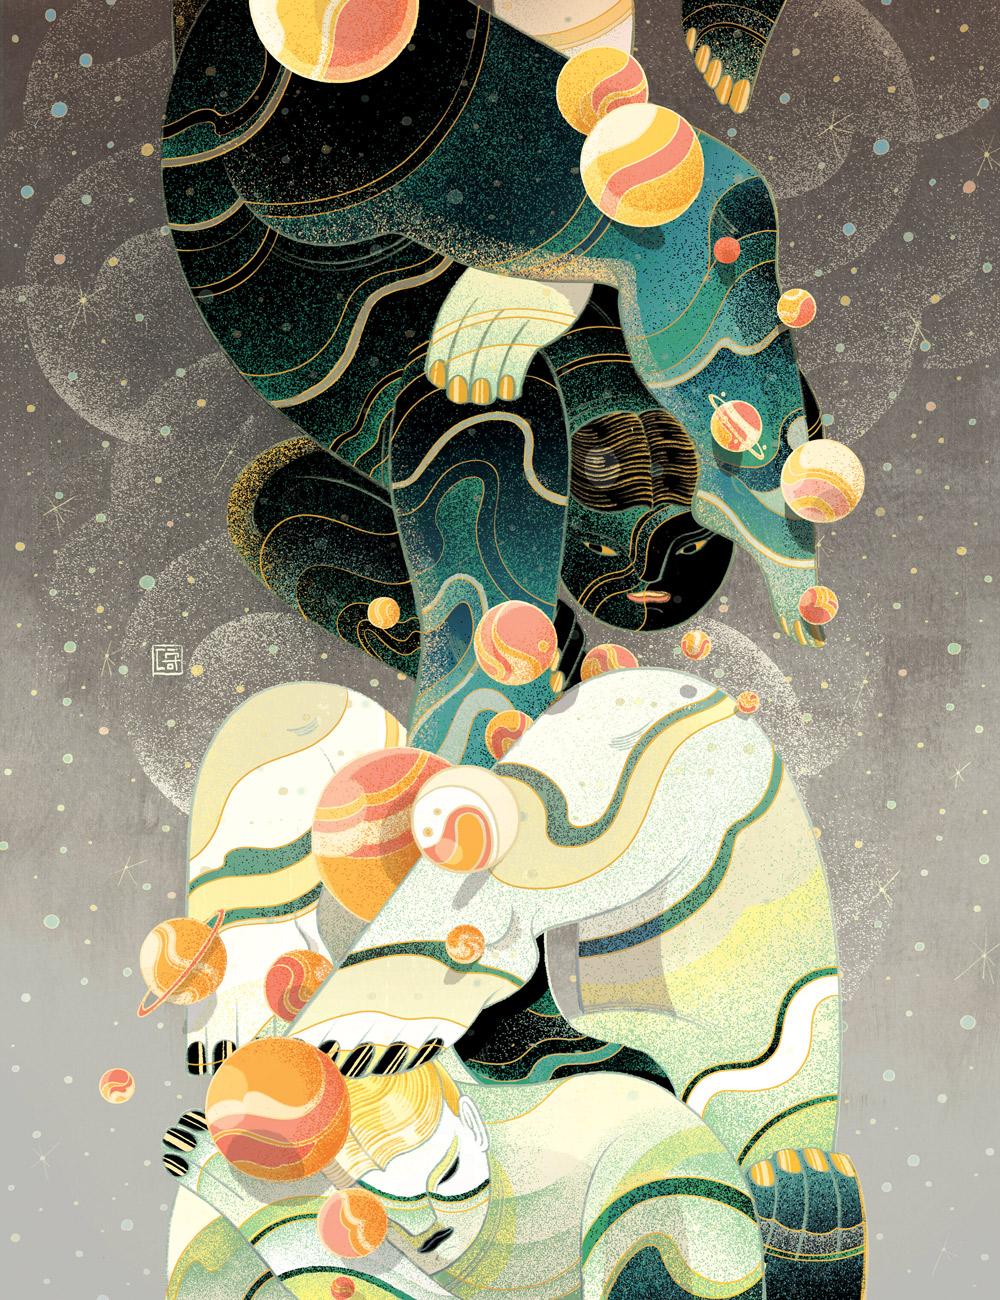 Art by Victo Ngai